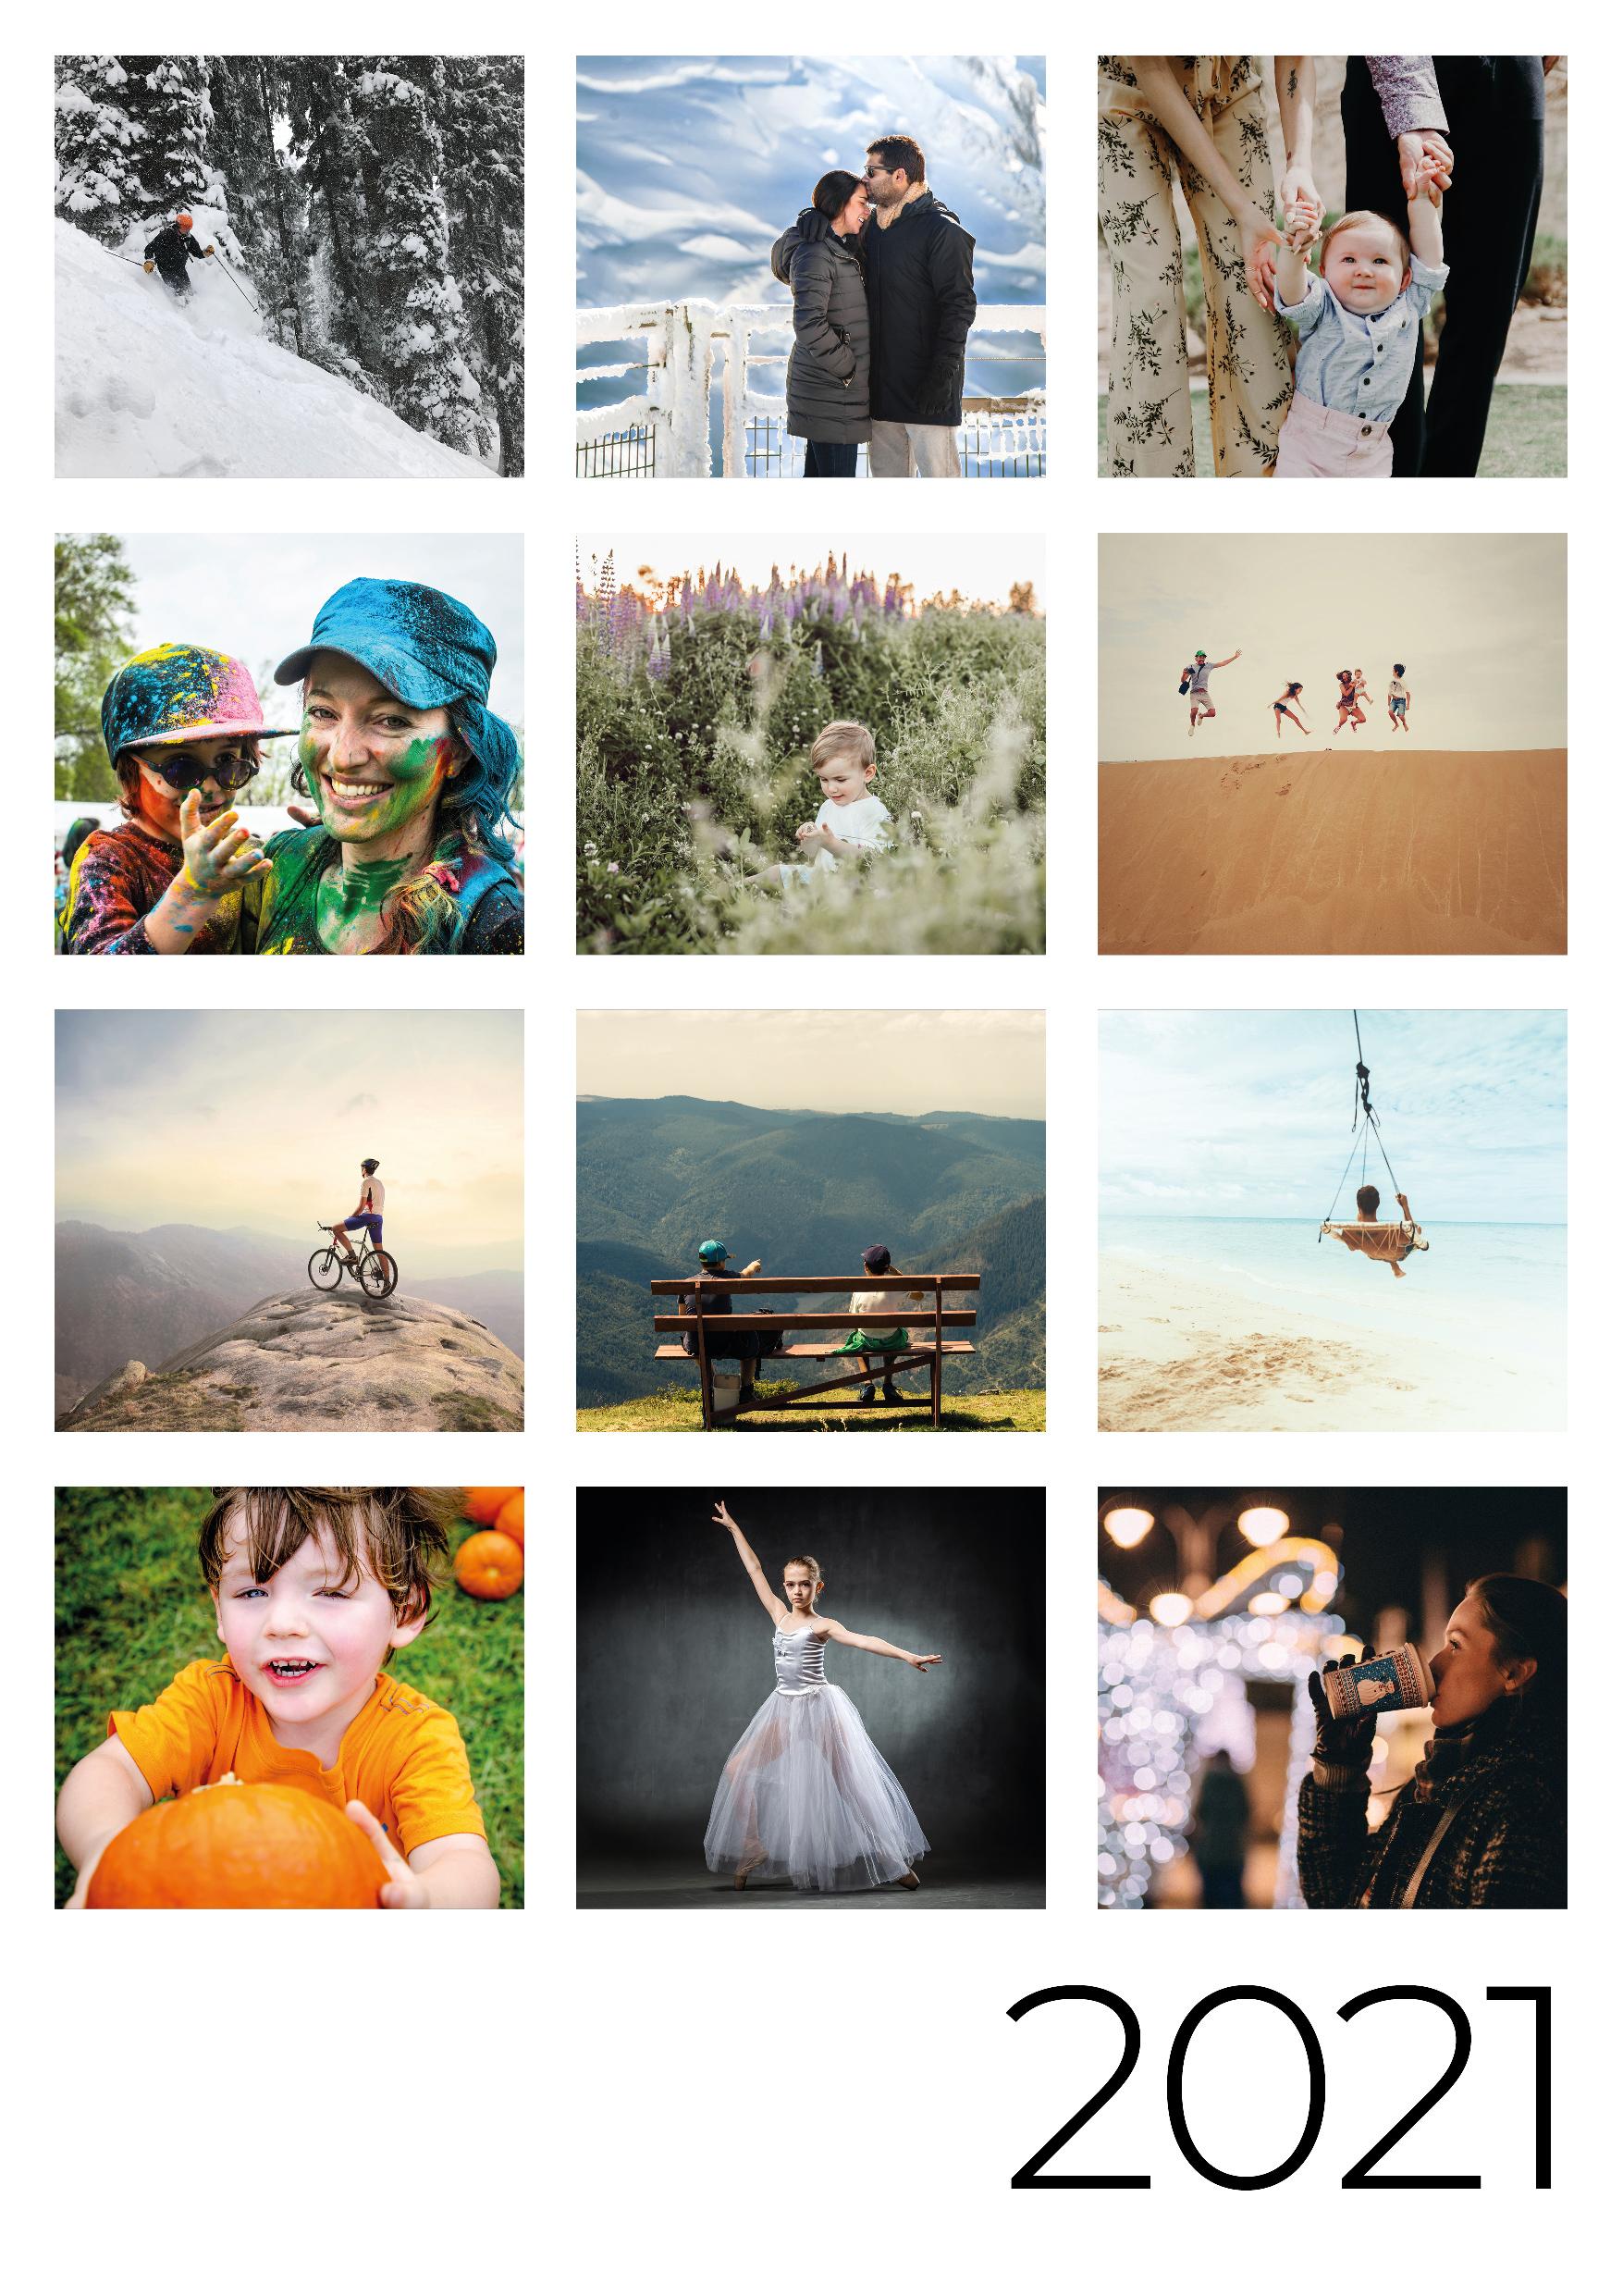 reakce_reklamni_a_komunikacni_centrum_kalendare_s_fotkama